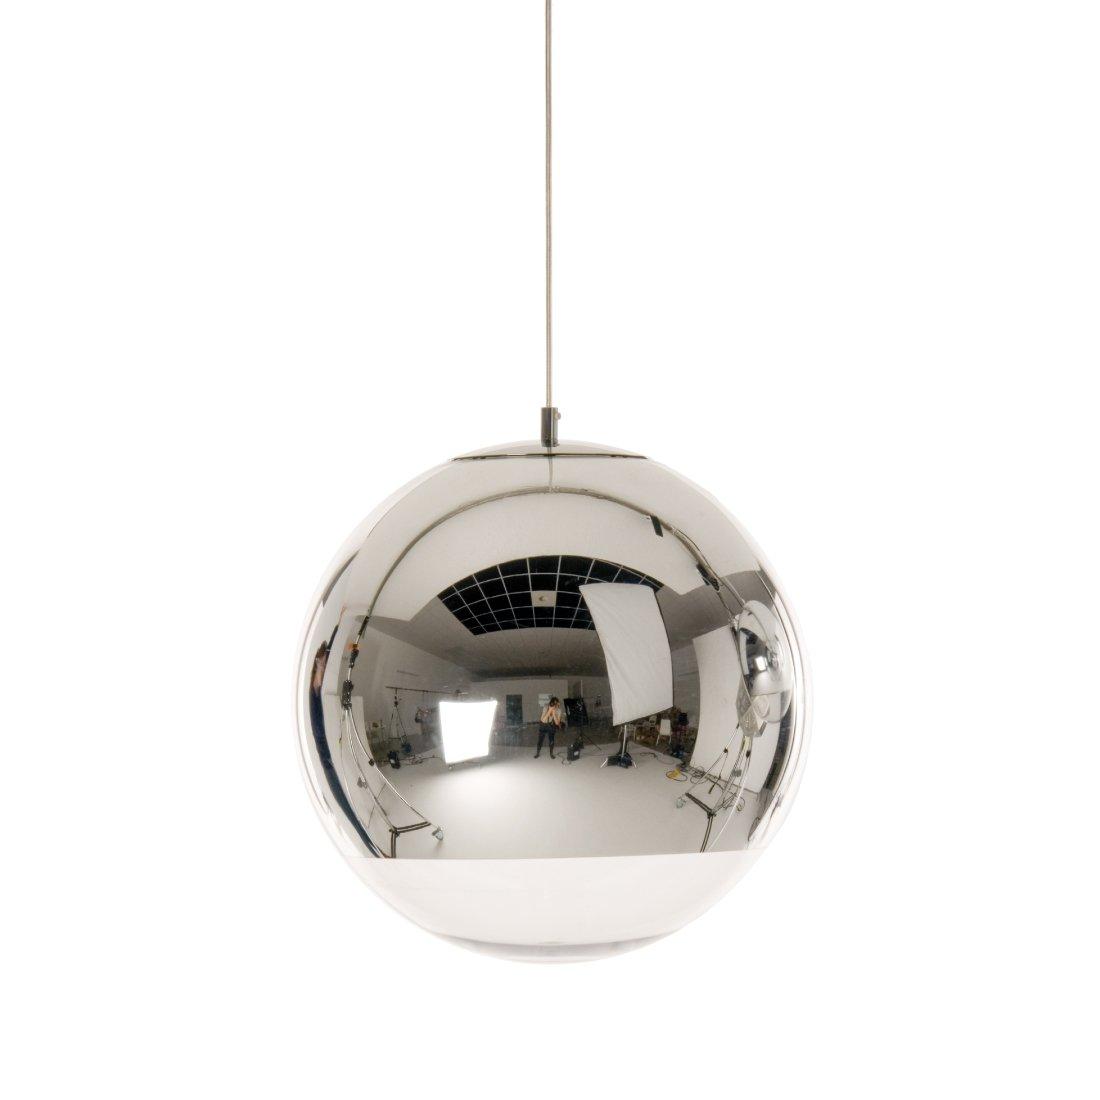 Tom Dixon Mirror Ball Hanglamp � 40 cm